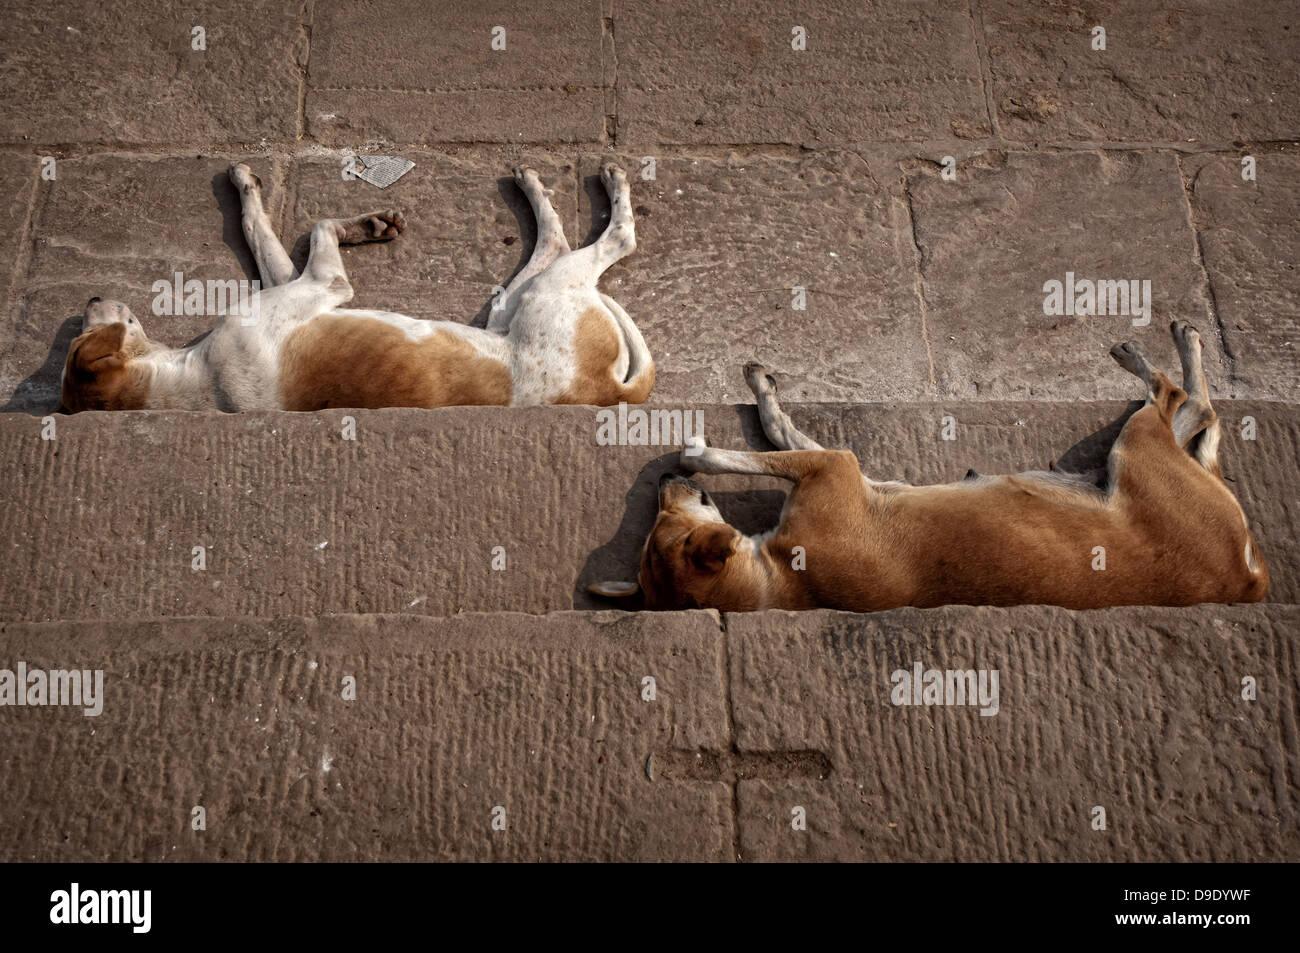 Dogs sleeping at the Ganges ghats. Varanasi, Benares, Uttar Pradesh, India - Stock Image